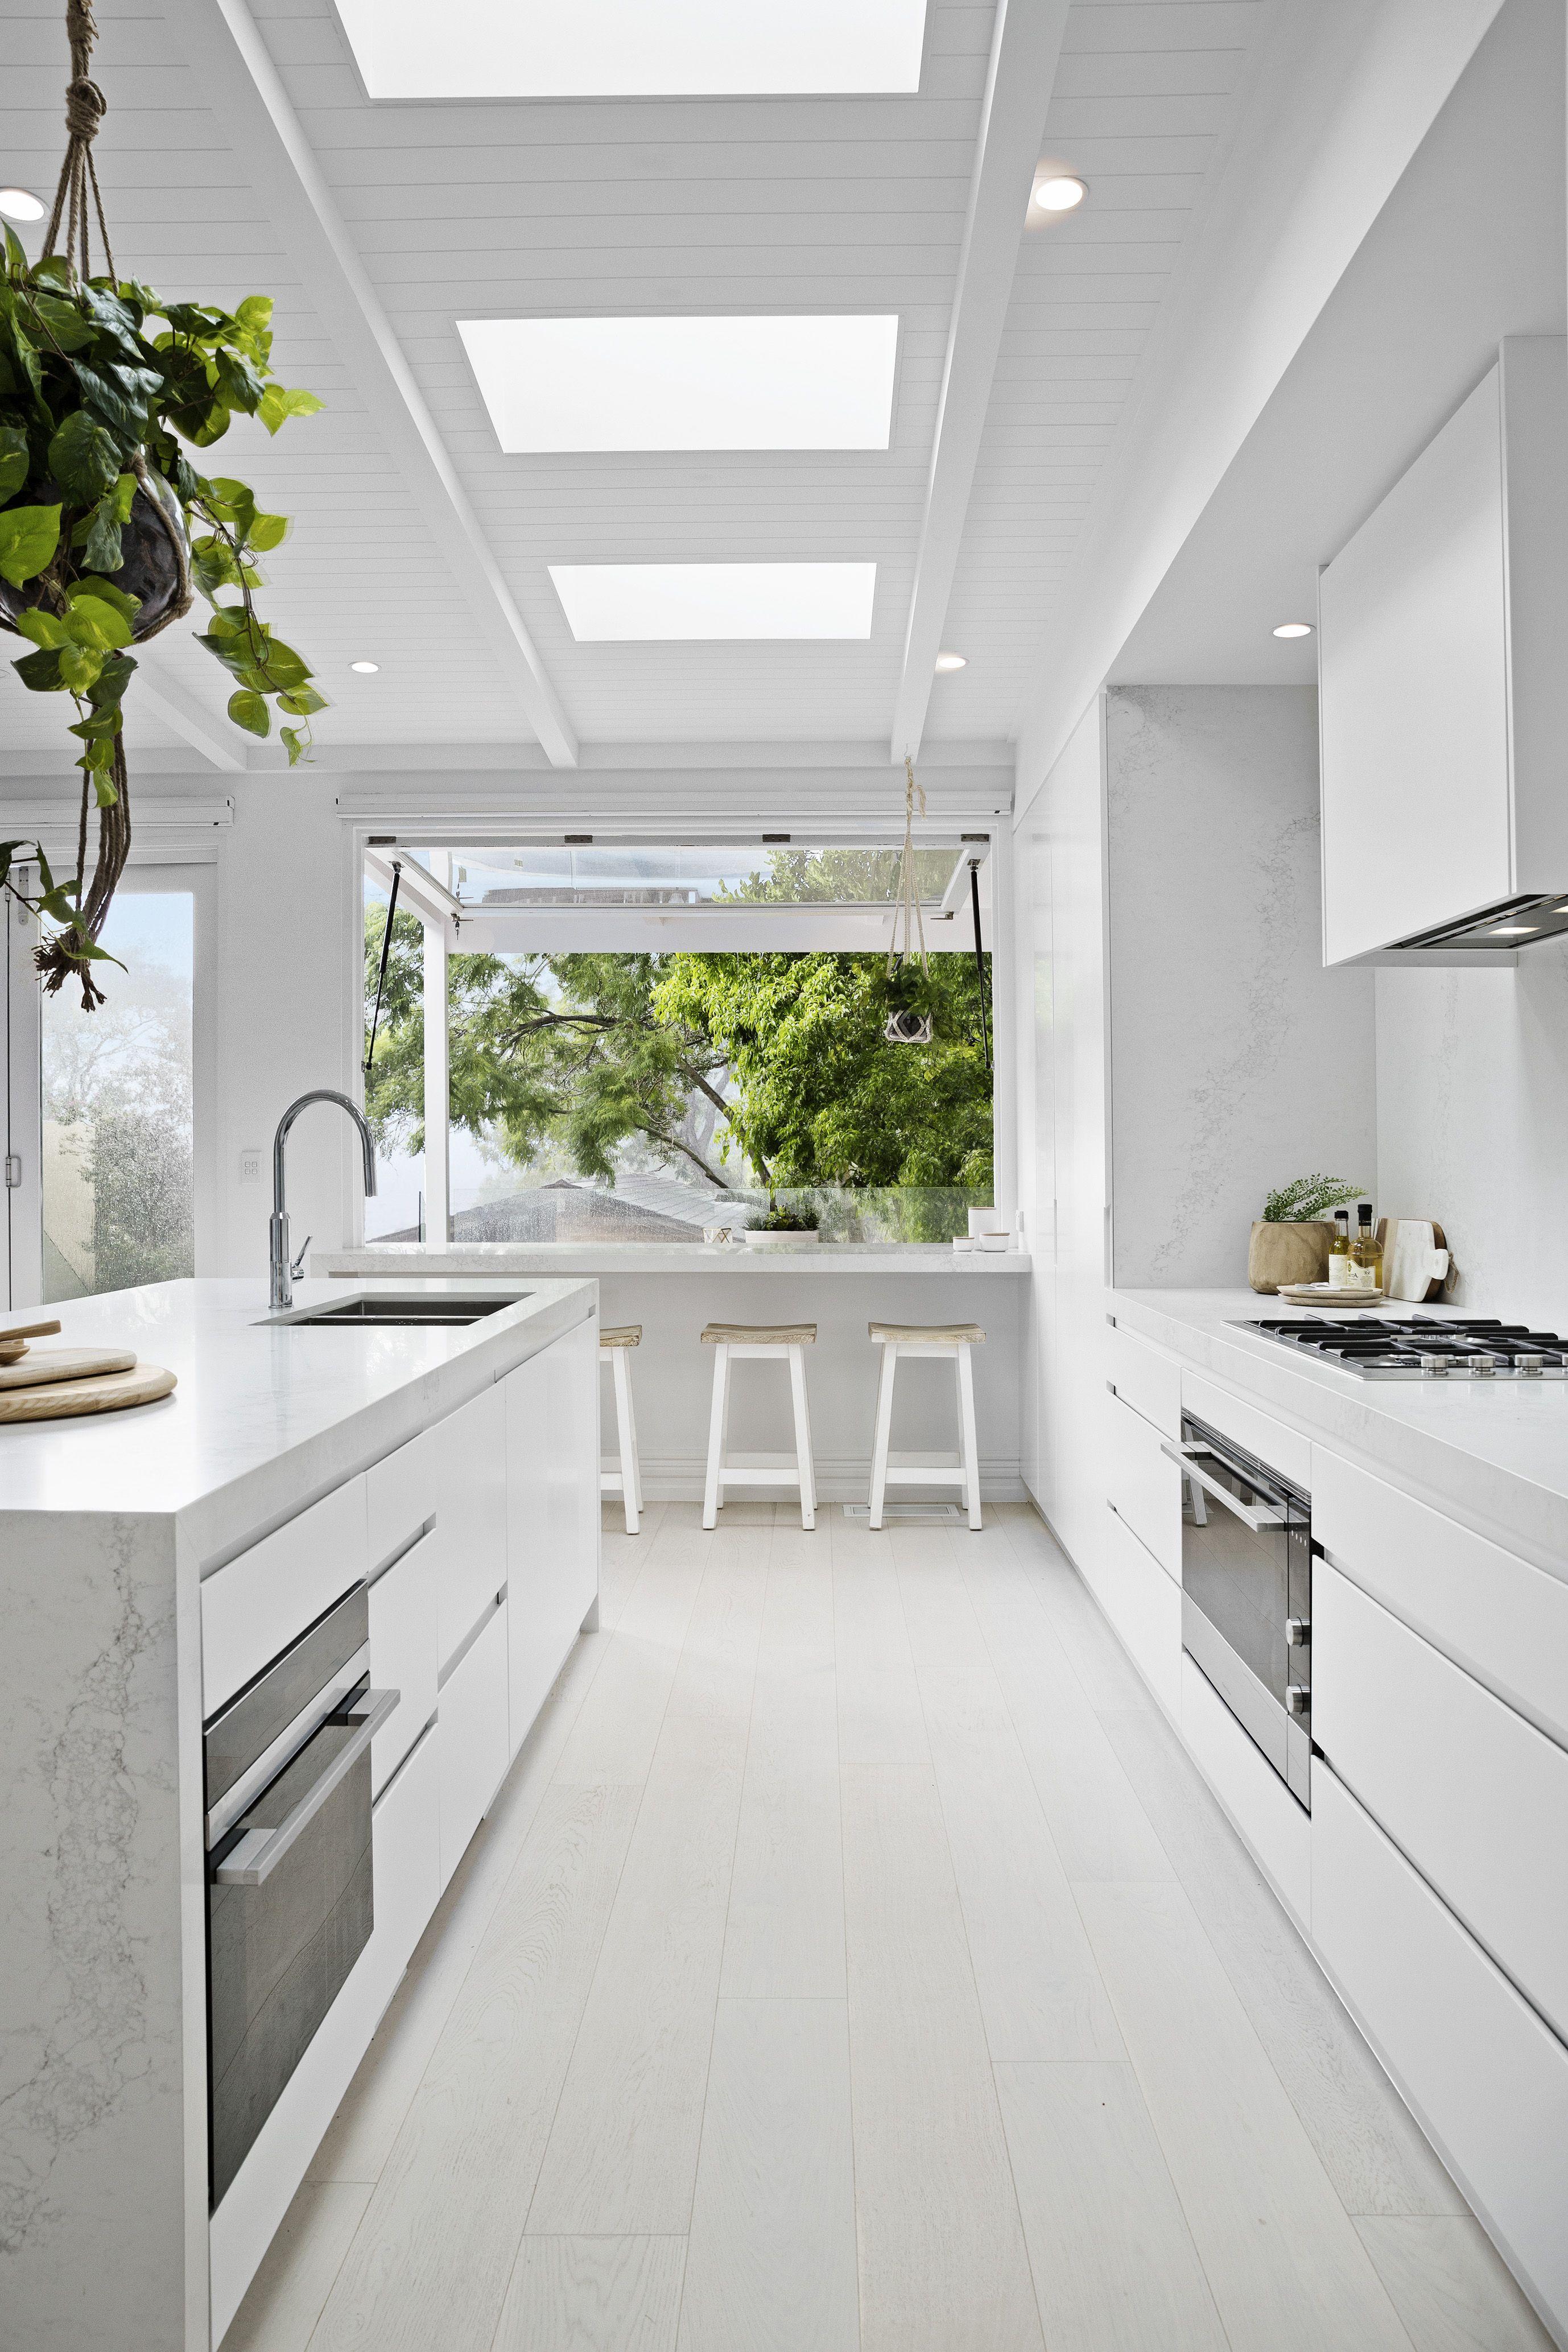 9 Sleek & Inspiring Luxury Kitchen Design Ideas Photos | Luxury ...